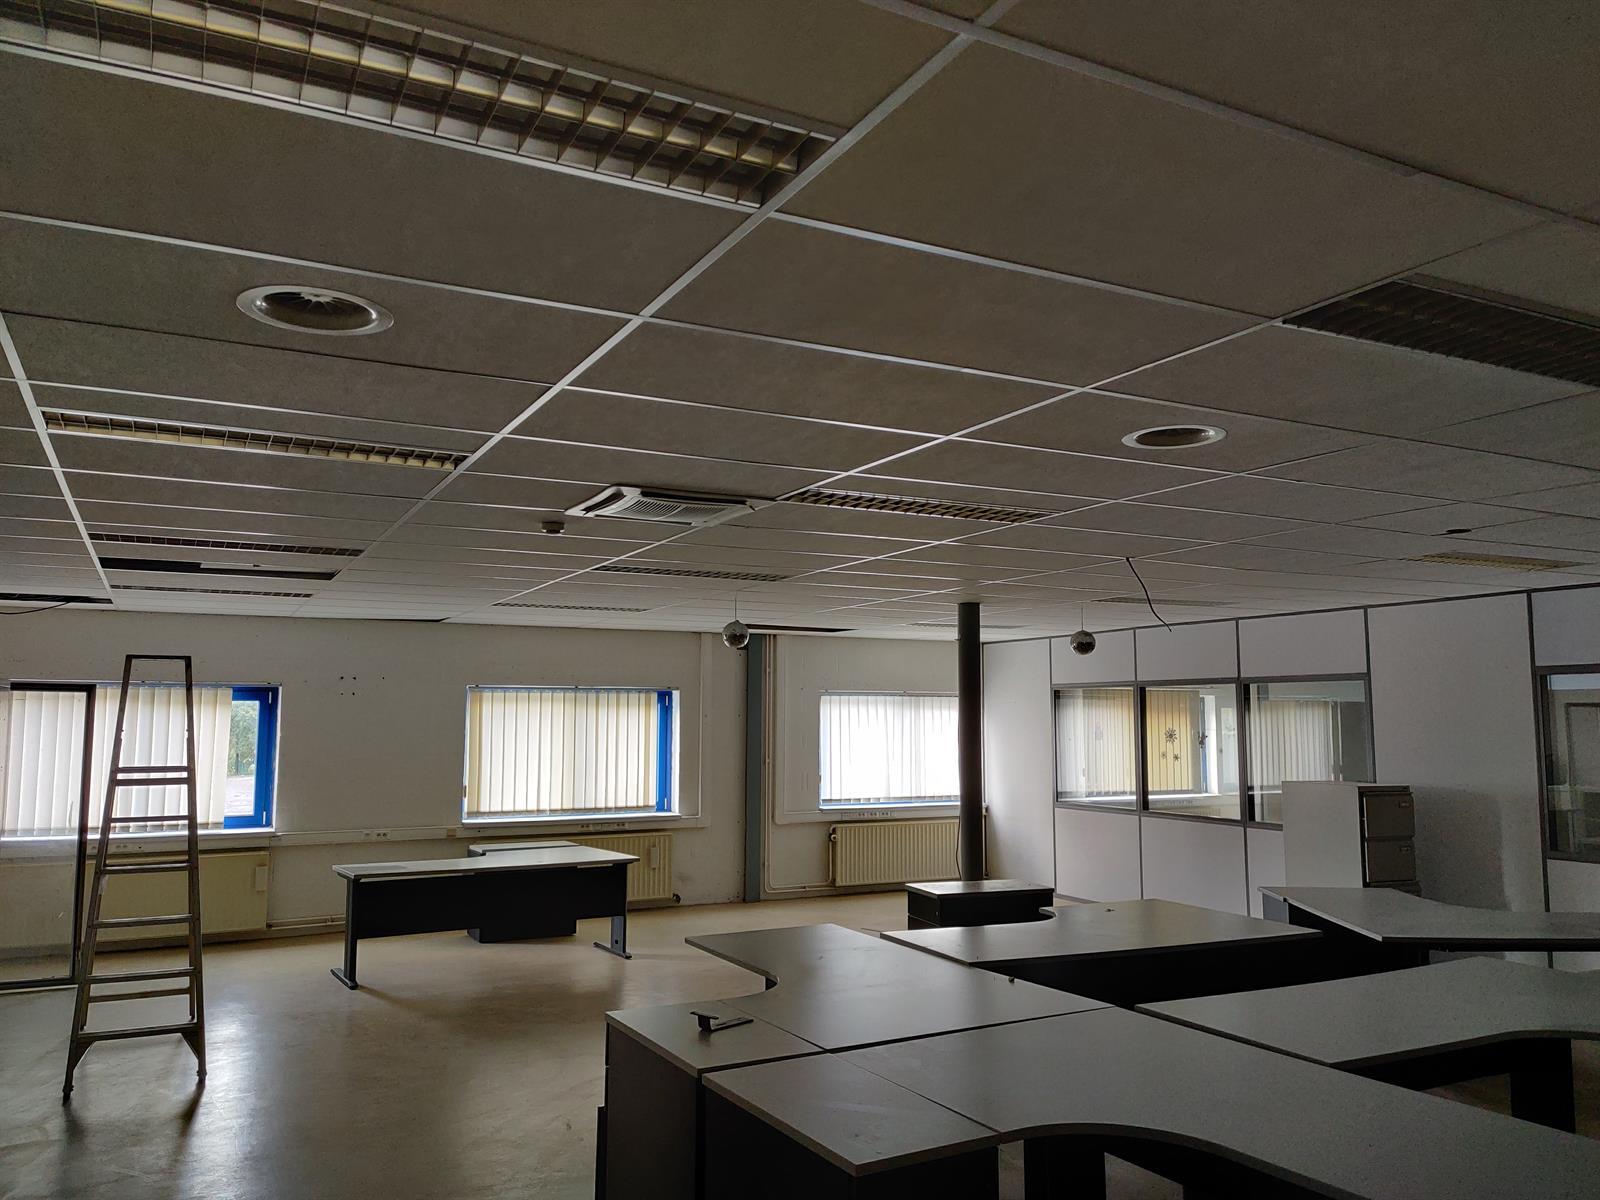 gebouw voor gemengd gebruik te huur I173 - Quatrieme Rue , 6040 Charleroi Jumet, België 23